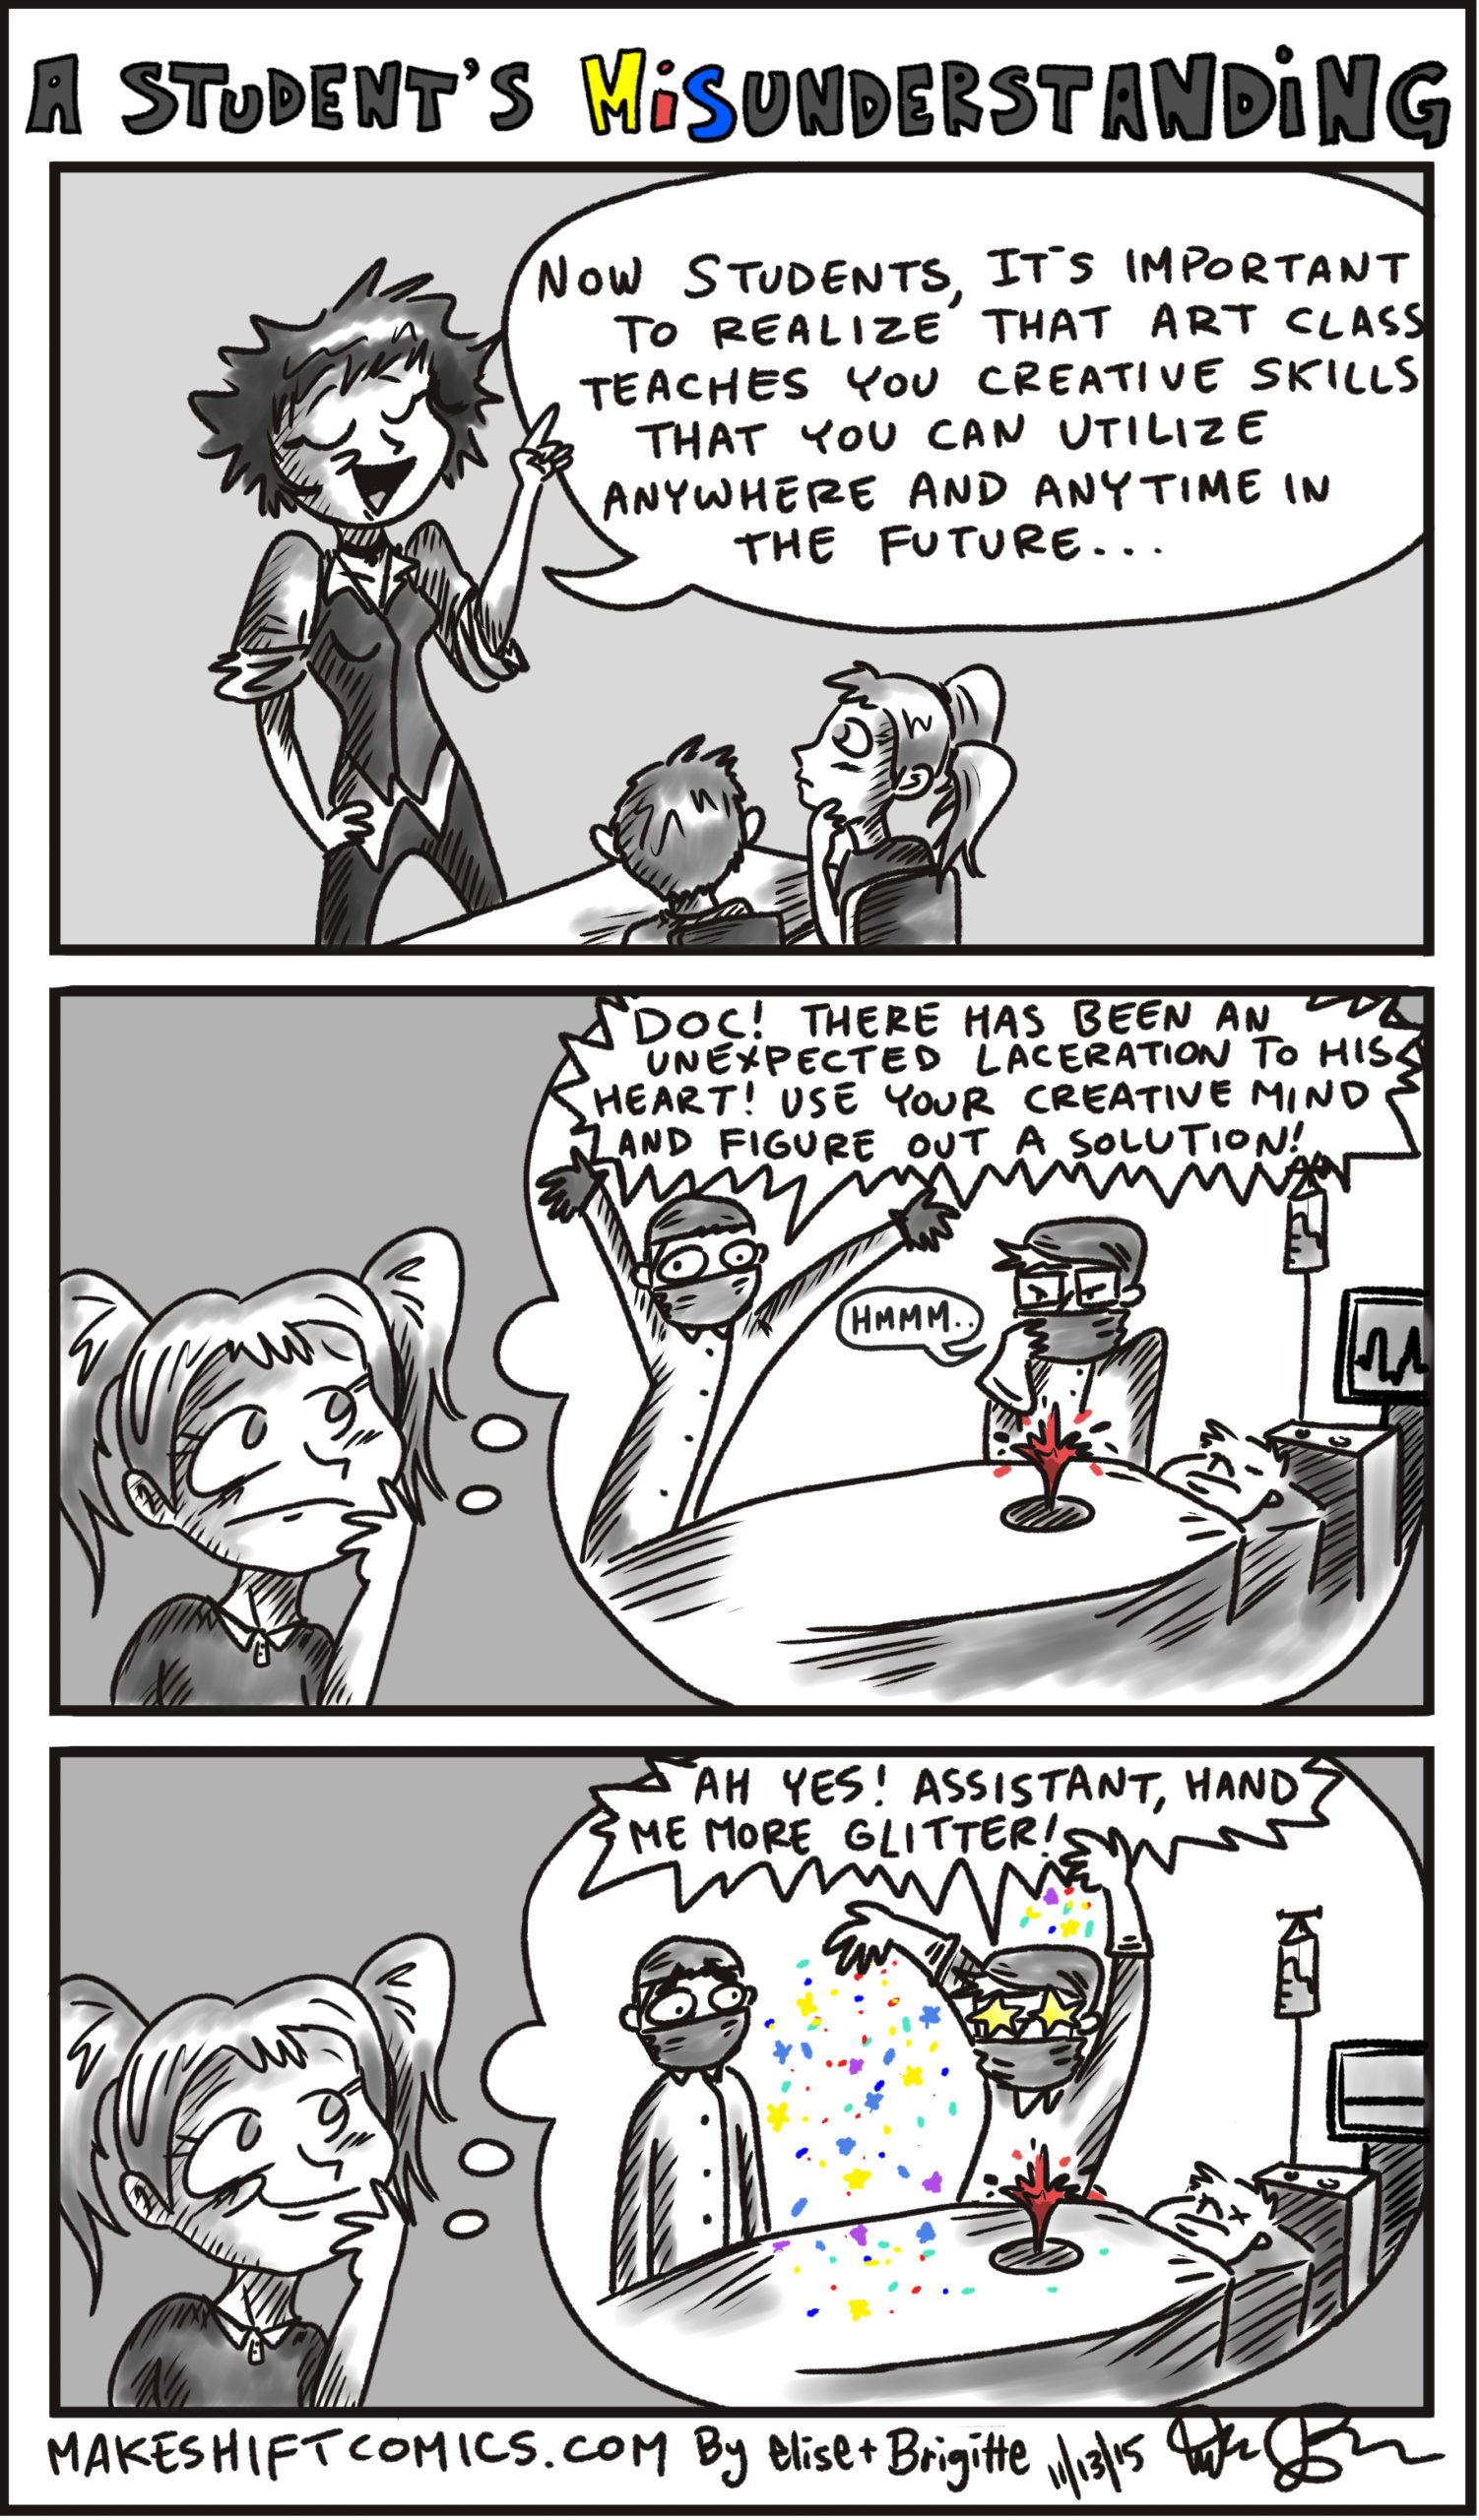 A Student's Misunderstanding